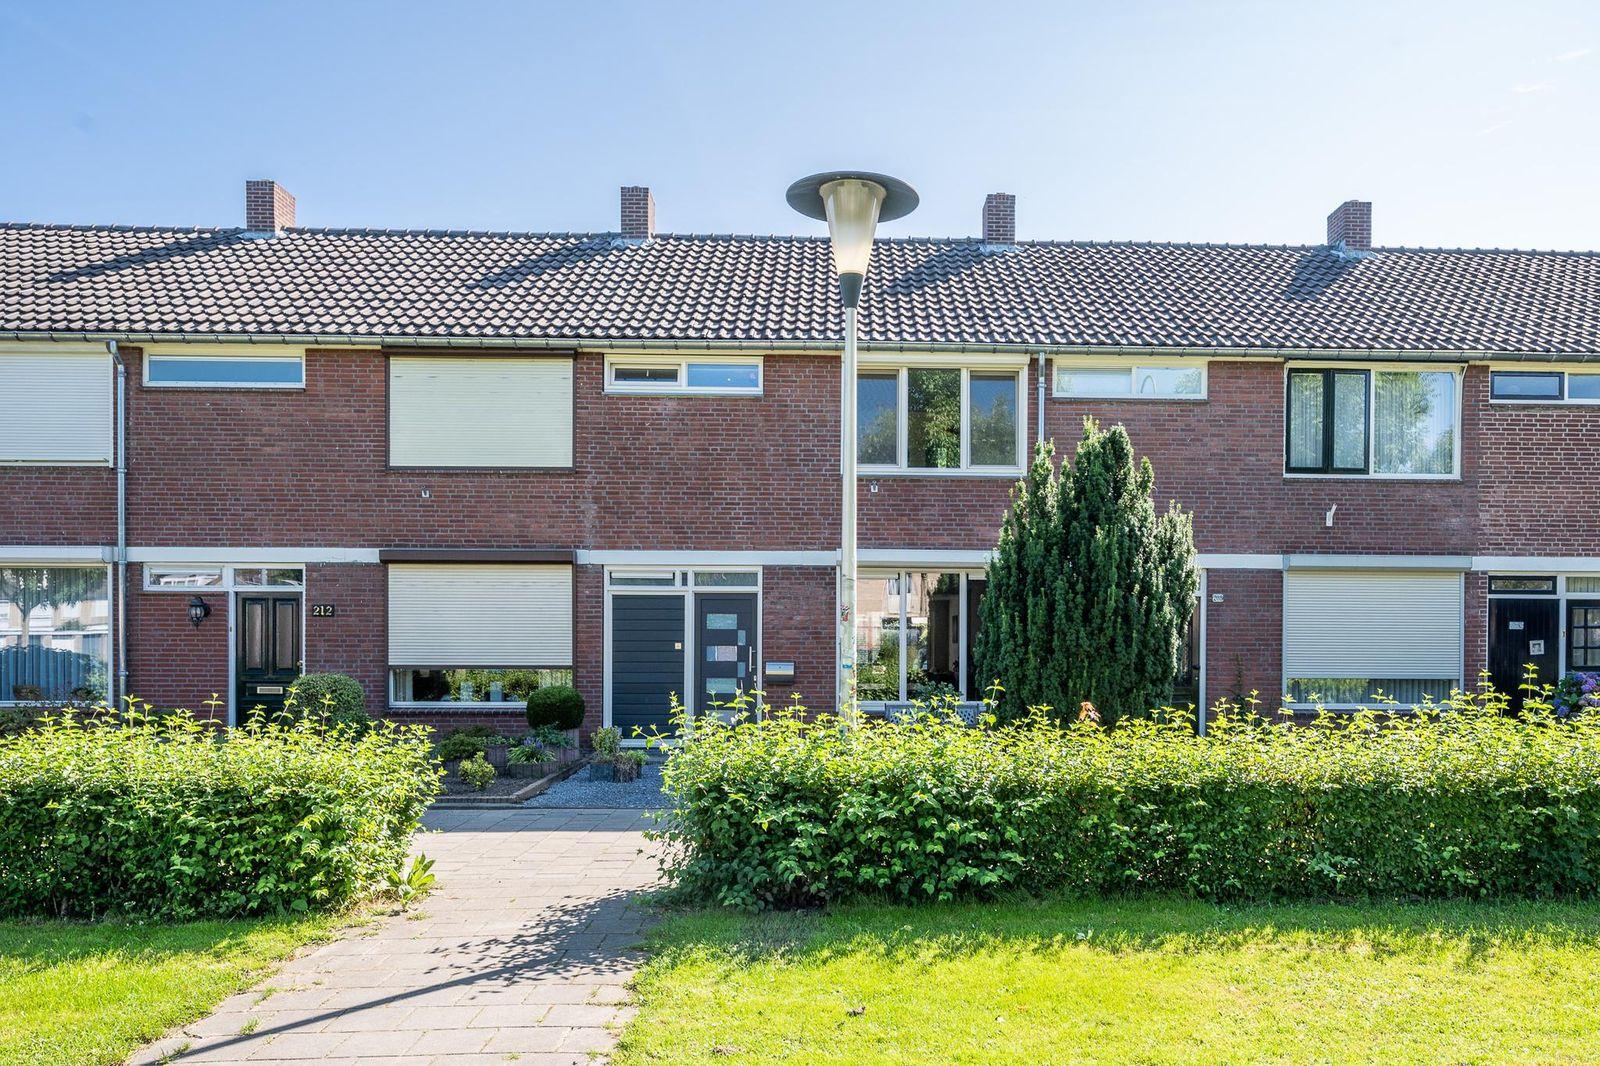 Vinkelaan 210, Helmond